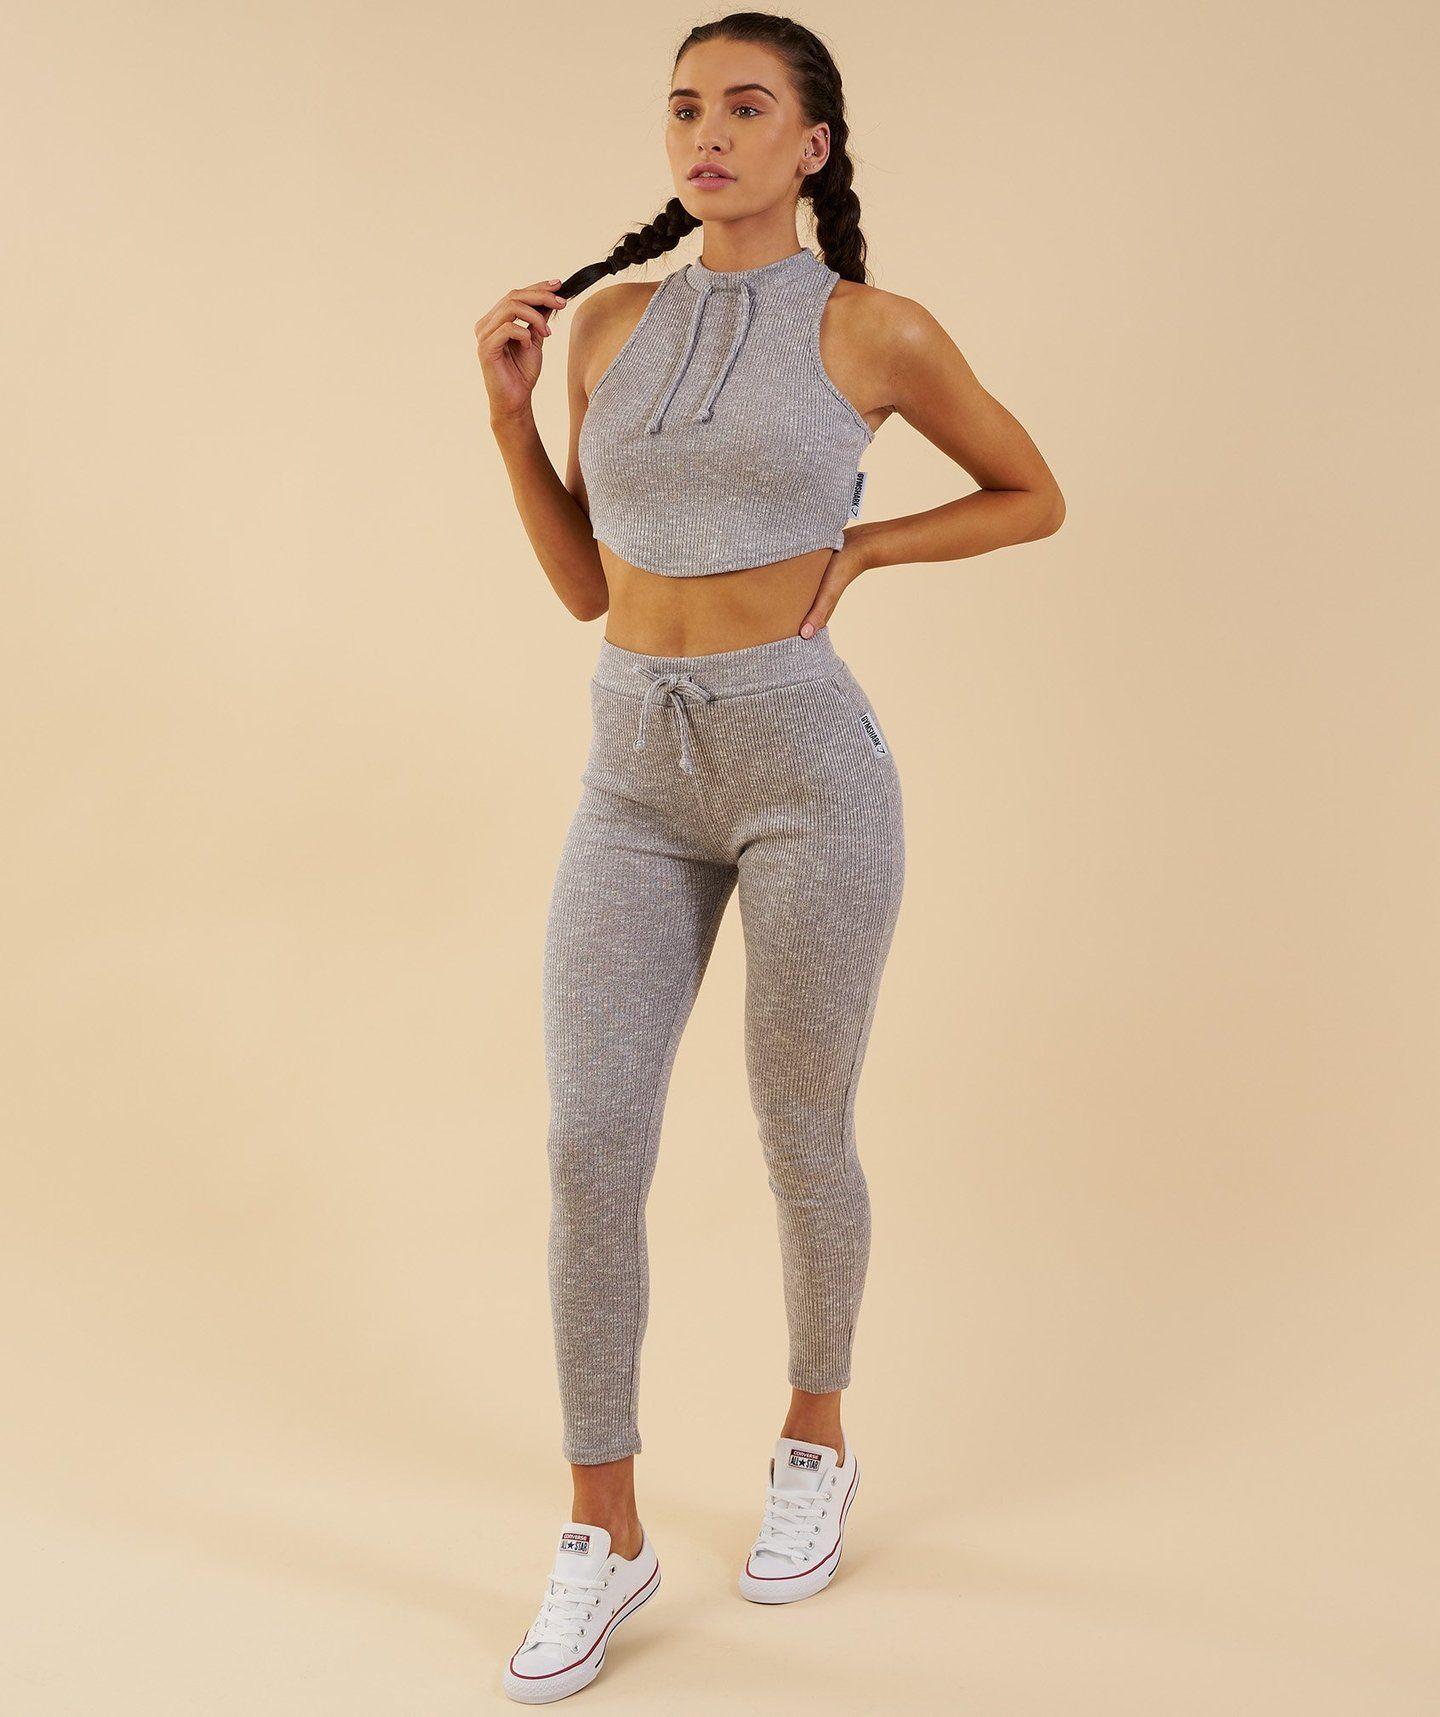 77172a697cfbc Gymshark Slounge Leggings - Light Grey Marl | Gym clothes | Tops for ...